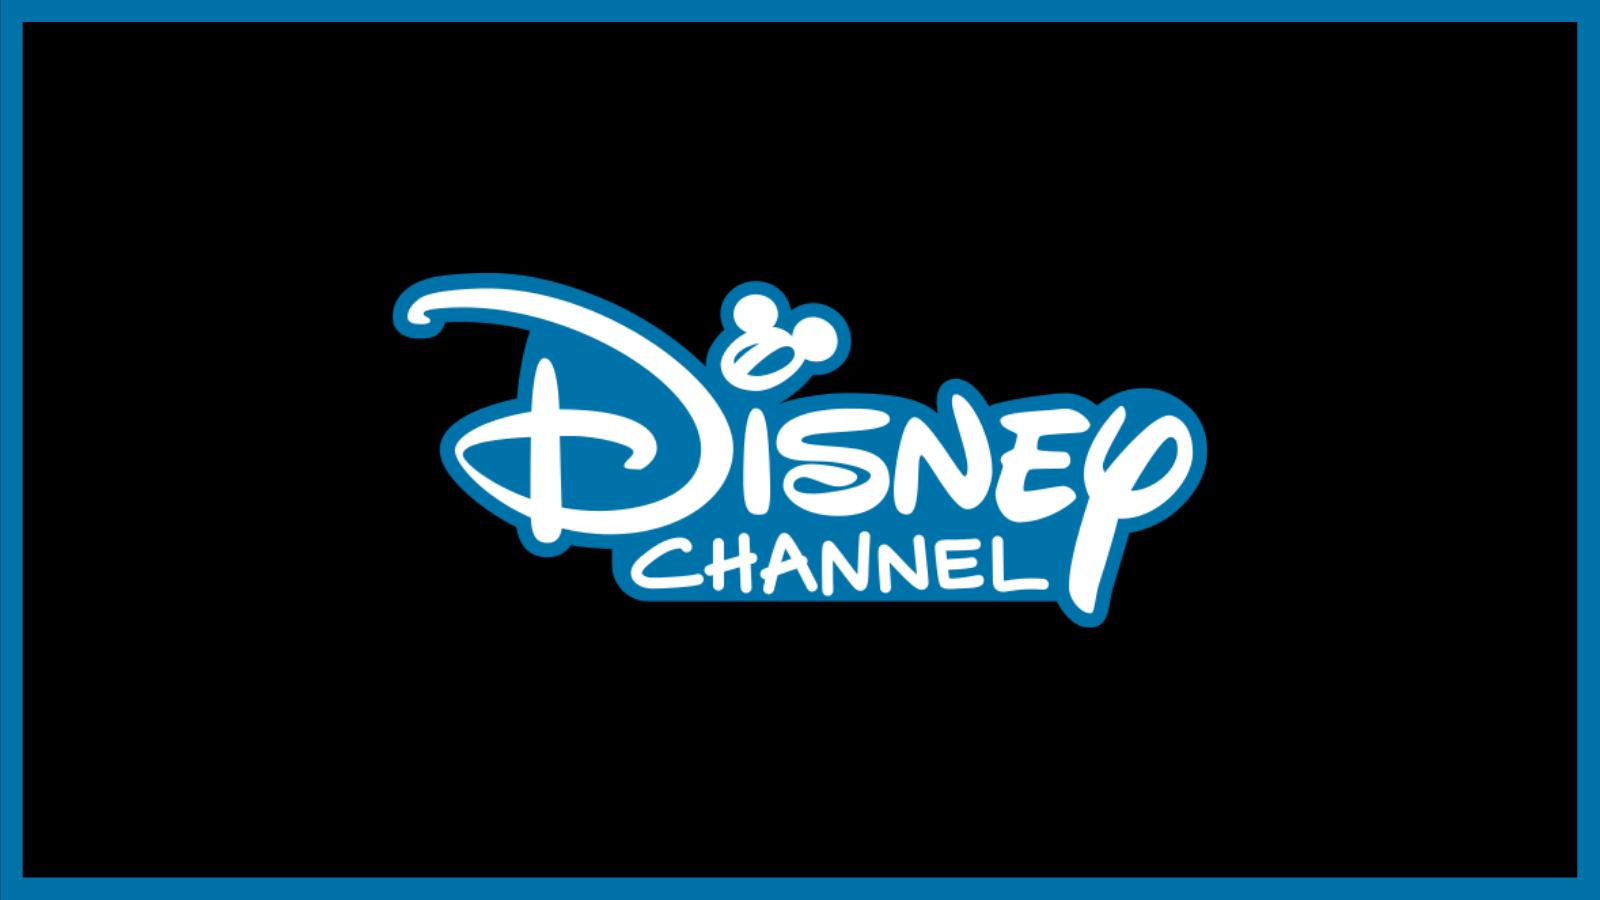 37 best Bizaardvark images on Pinterest | Disney channel